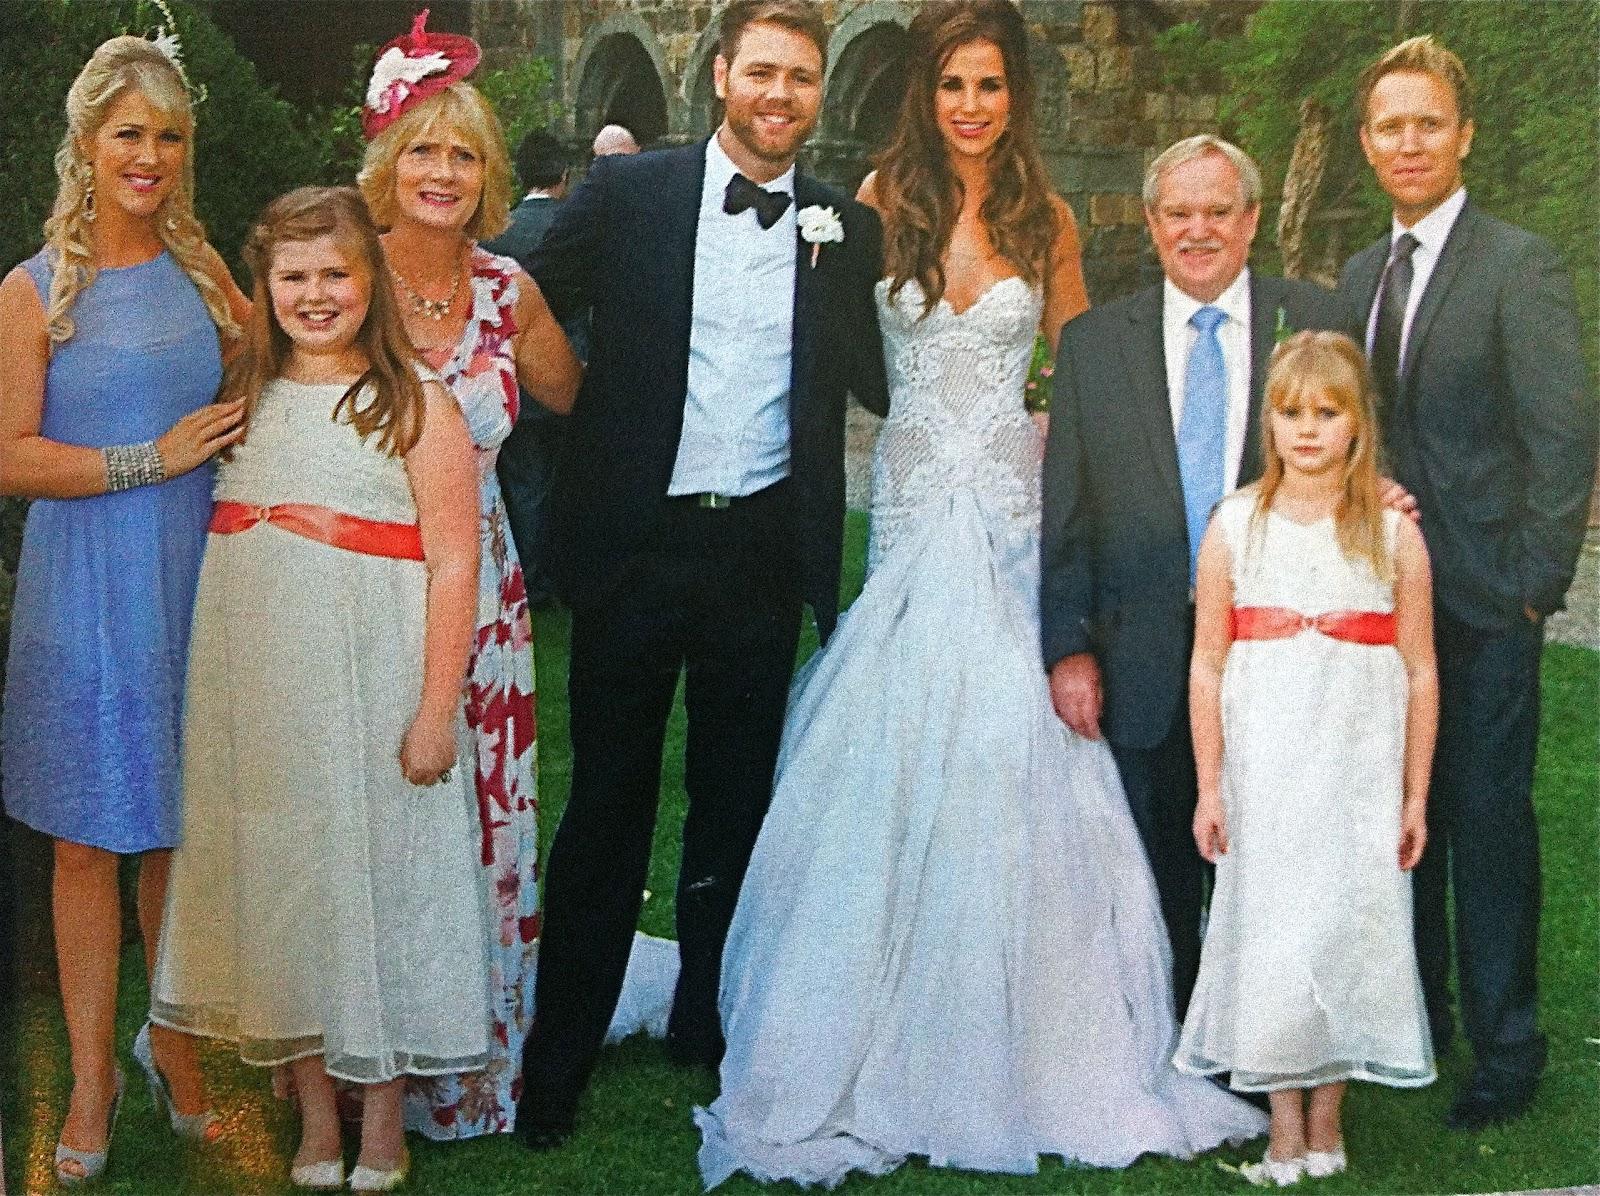 Tara mcfadden wedding